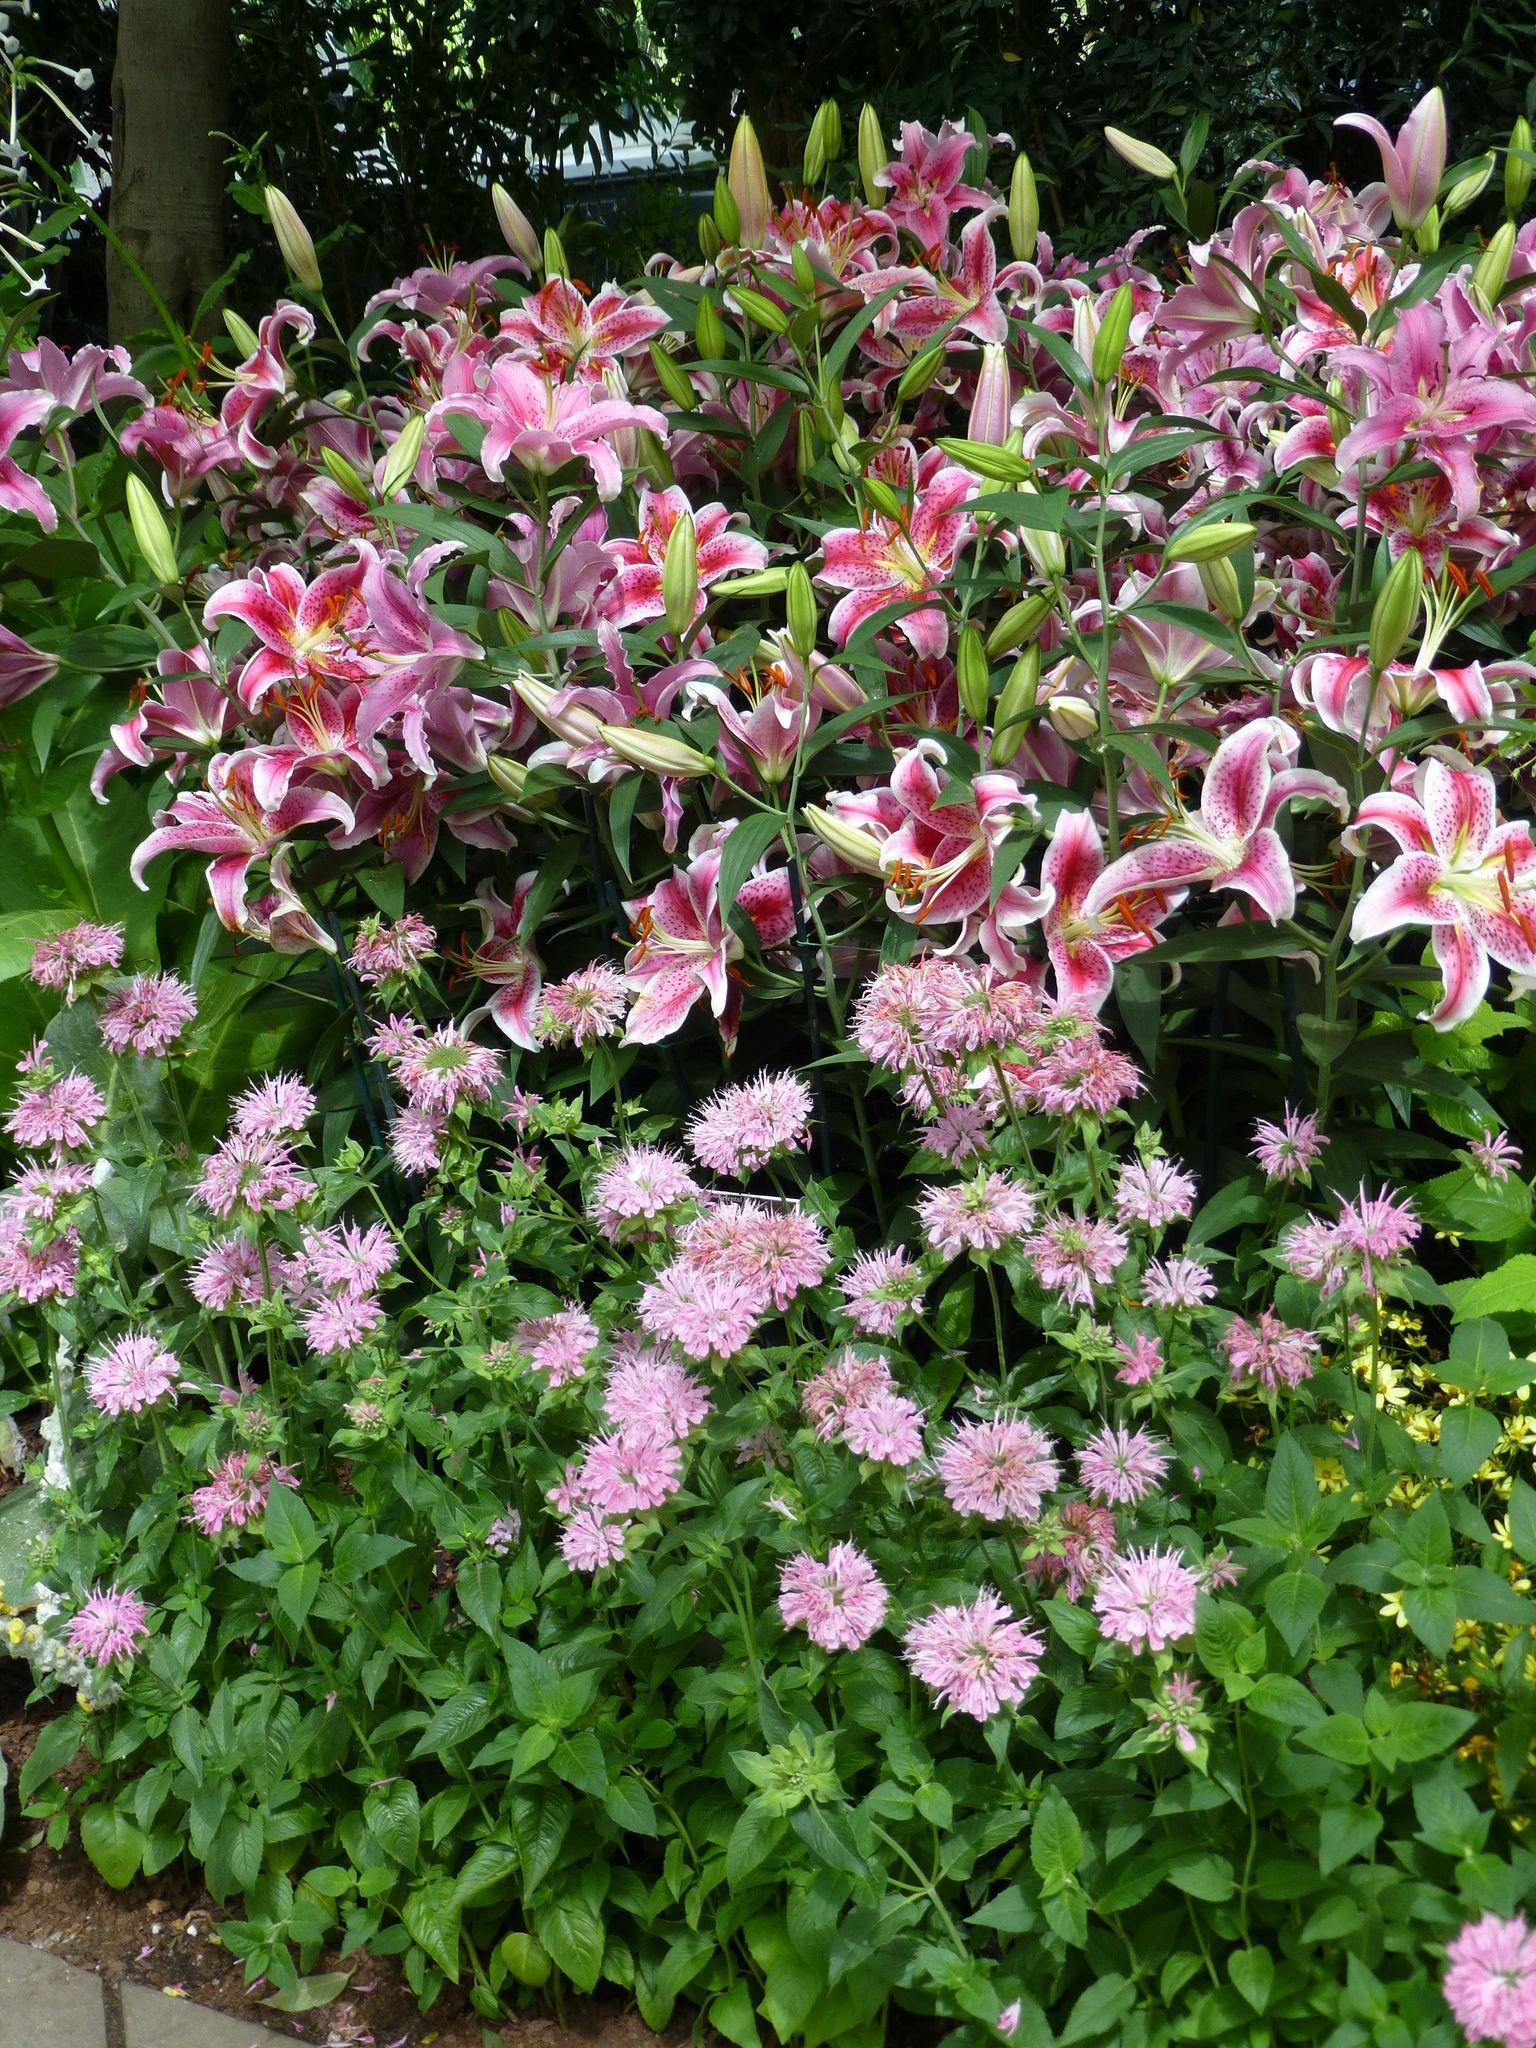 https://flic.kr/p/FncZo3 | Star Gaze Lilies and Monarda [Bee Balm]  P1040518